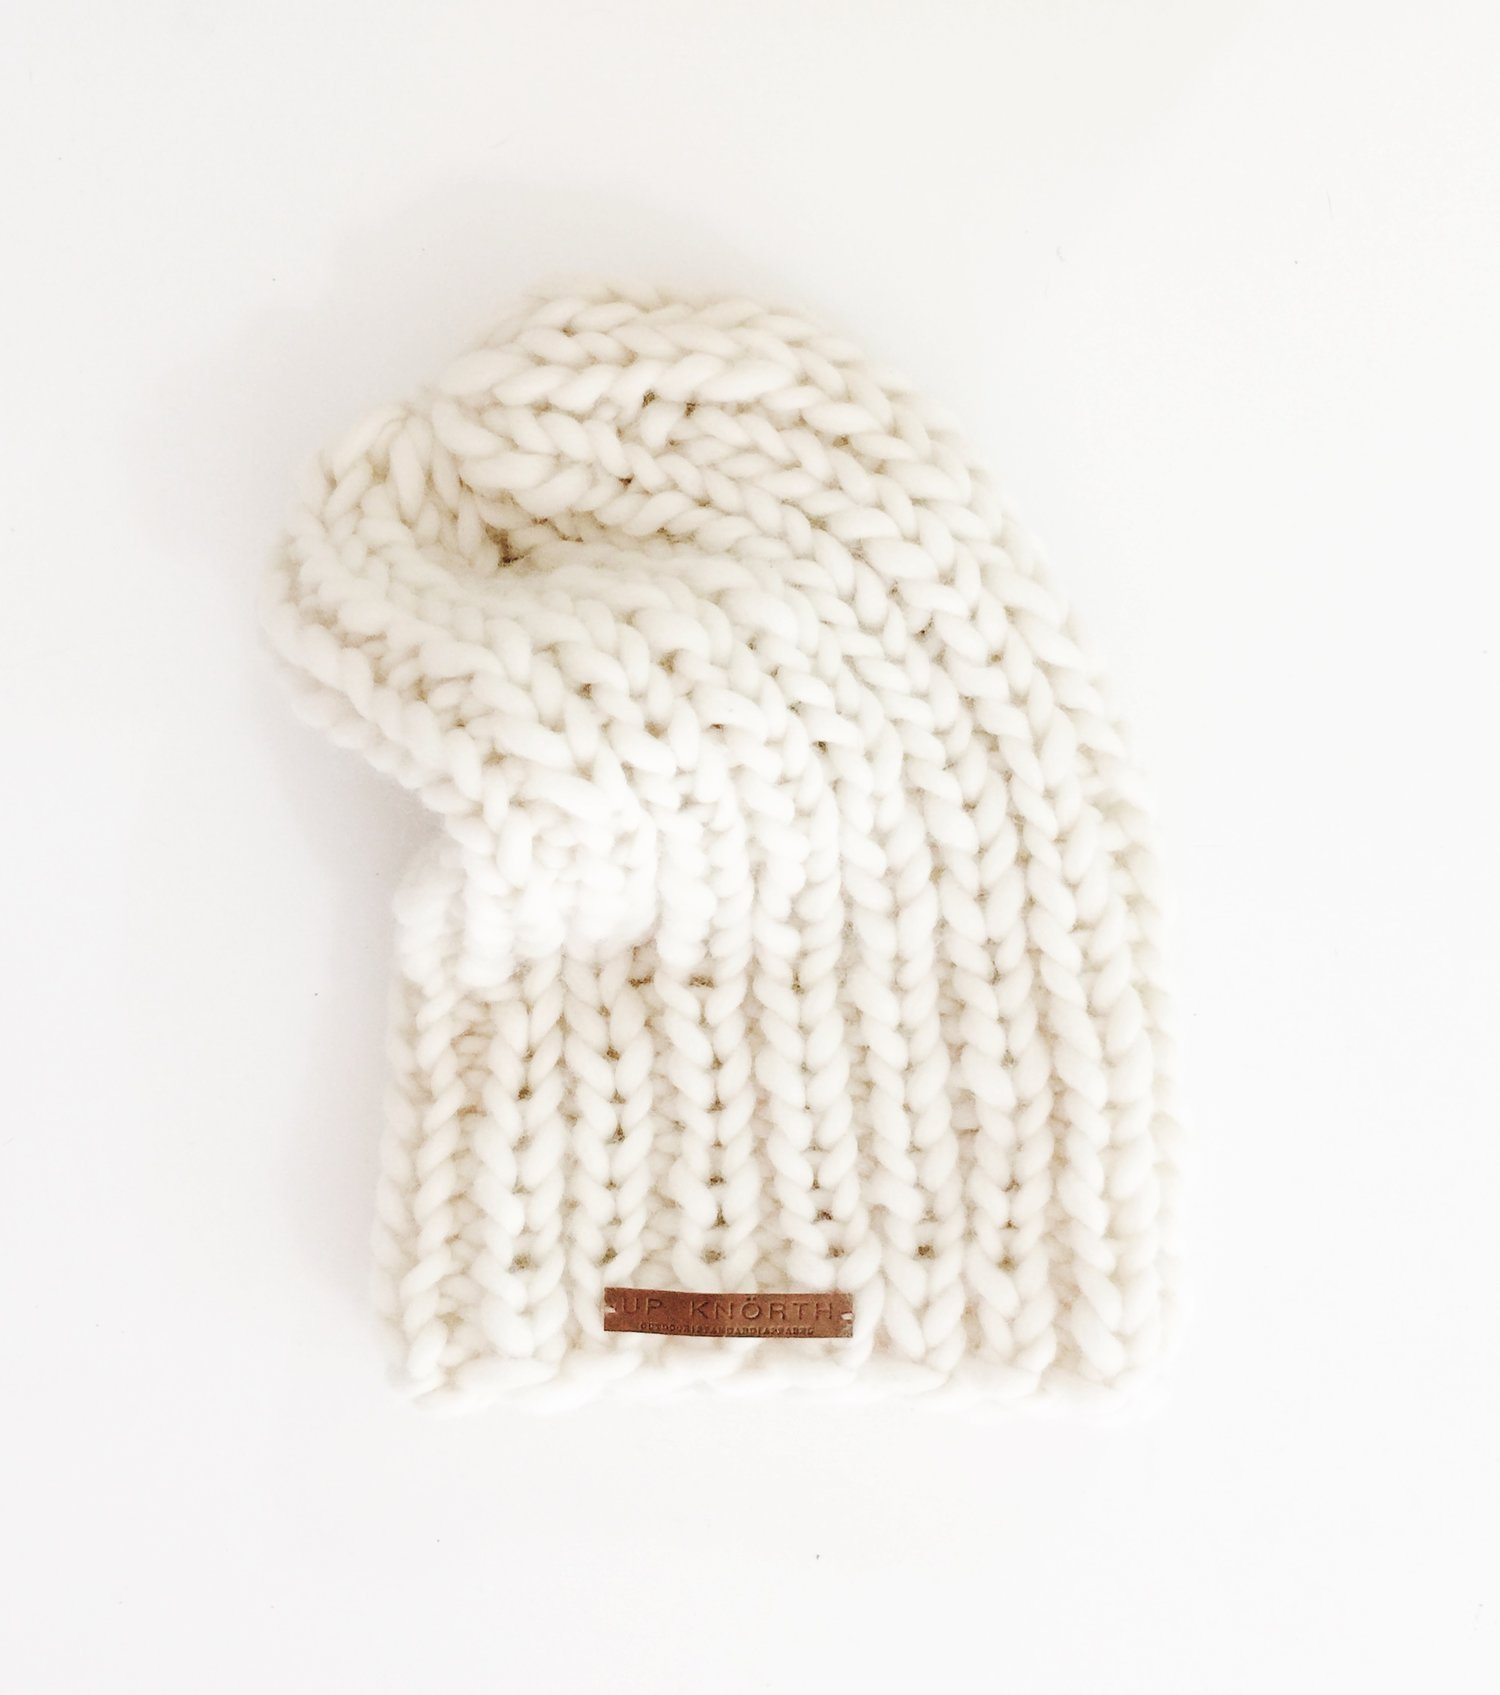 Wool Knit Toque — UP KNÖRTH 3978493e231